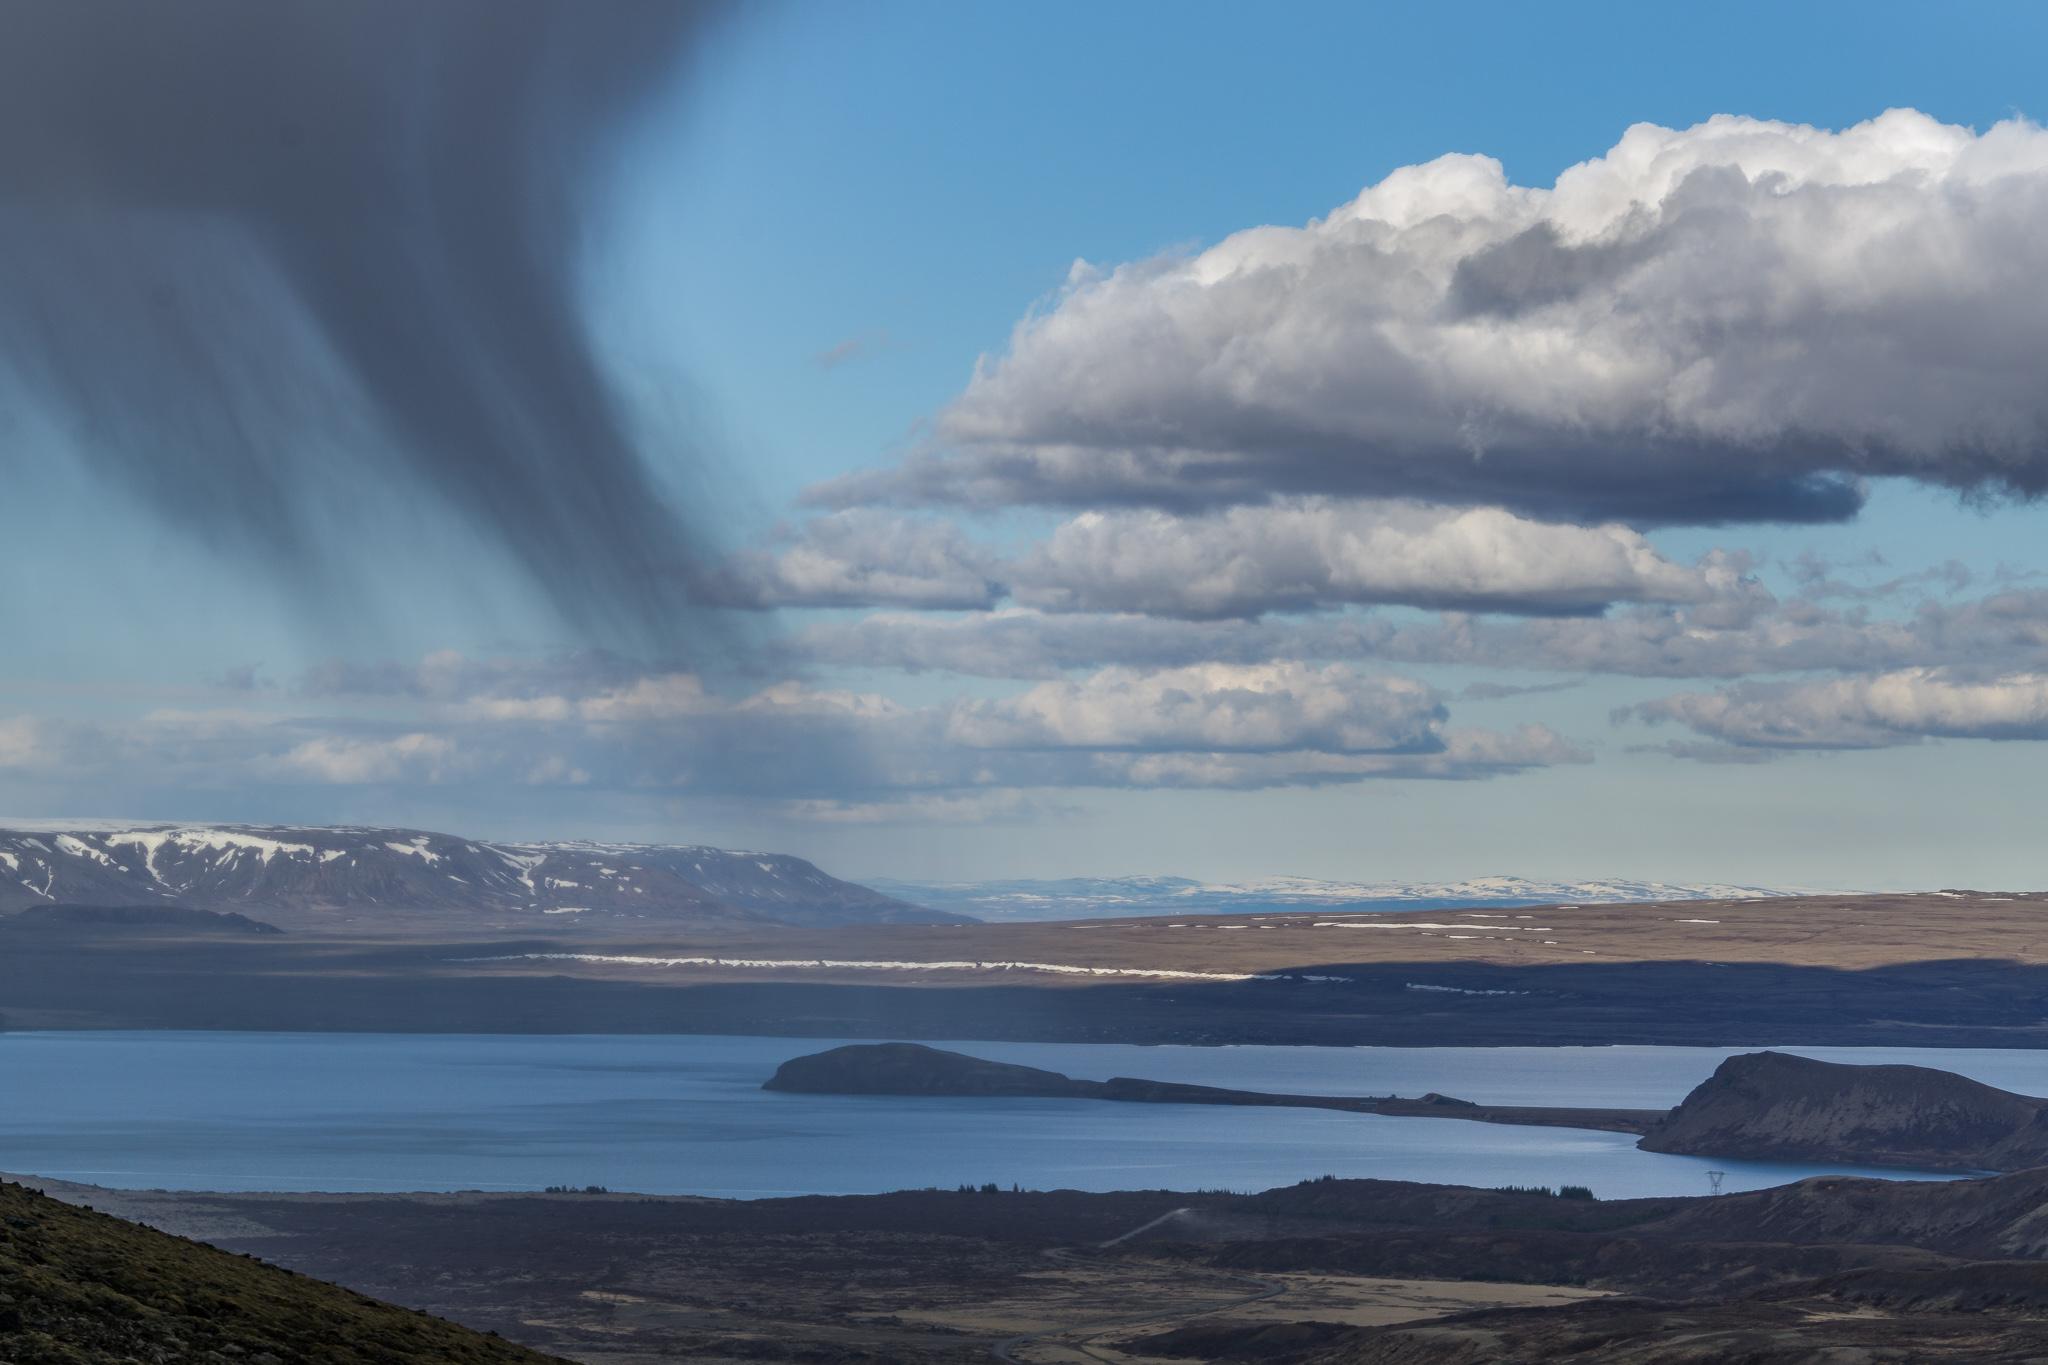 Virga phenomenon above Thingvellir. Iceland